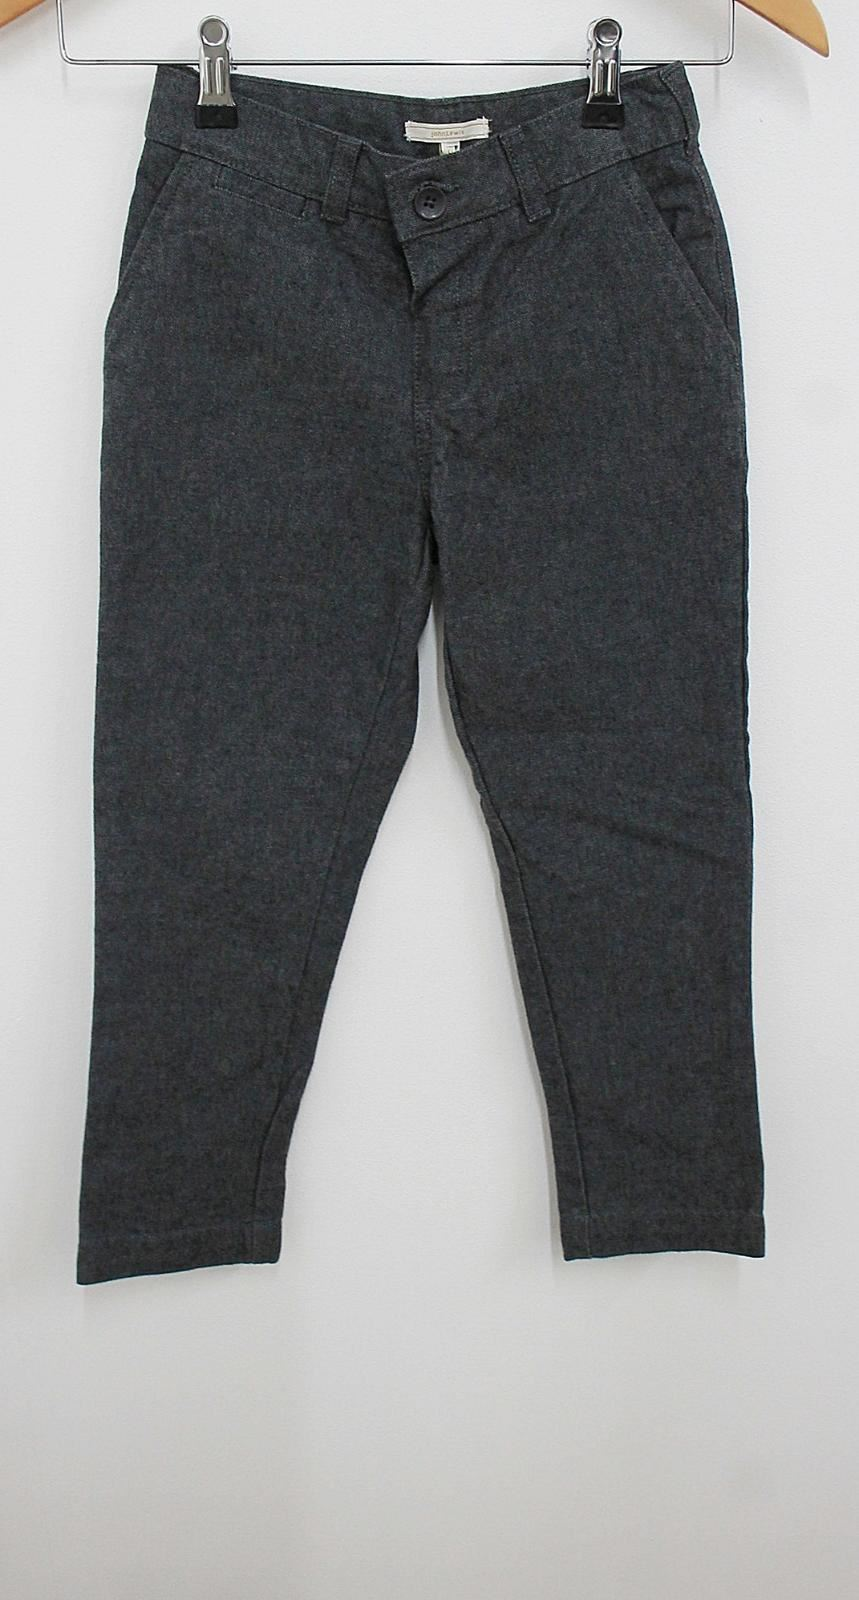 JOHN LEWIS Boy's Dark Grey Elastic Waist Skinny Fit Cotton Trousers 5 Yrs. NEW